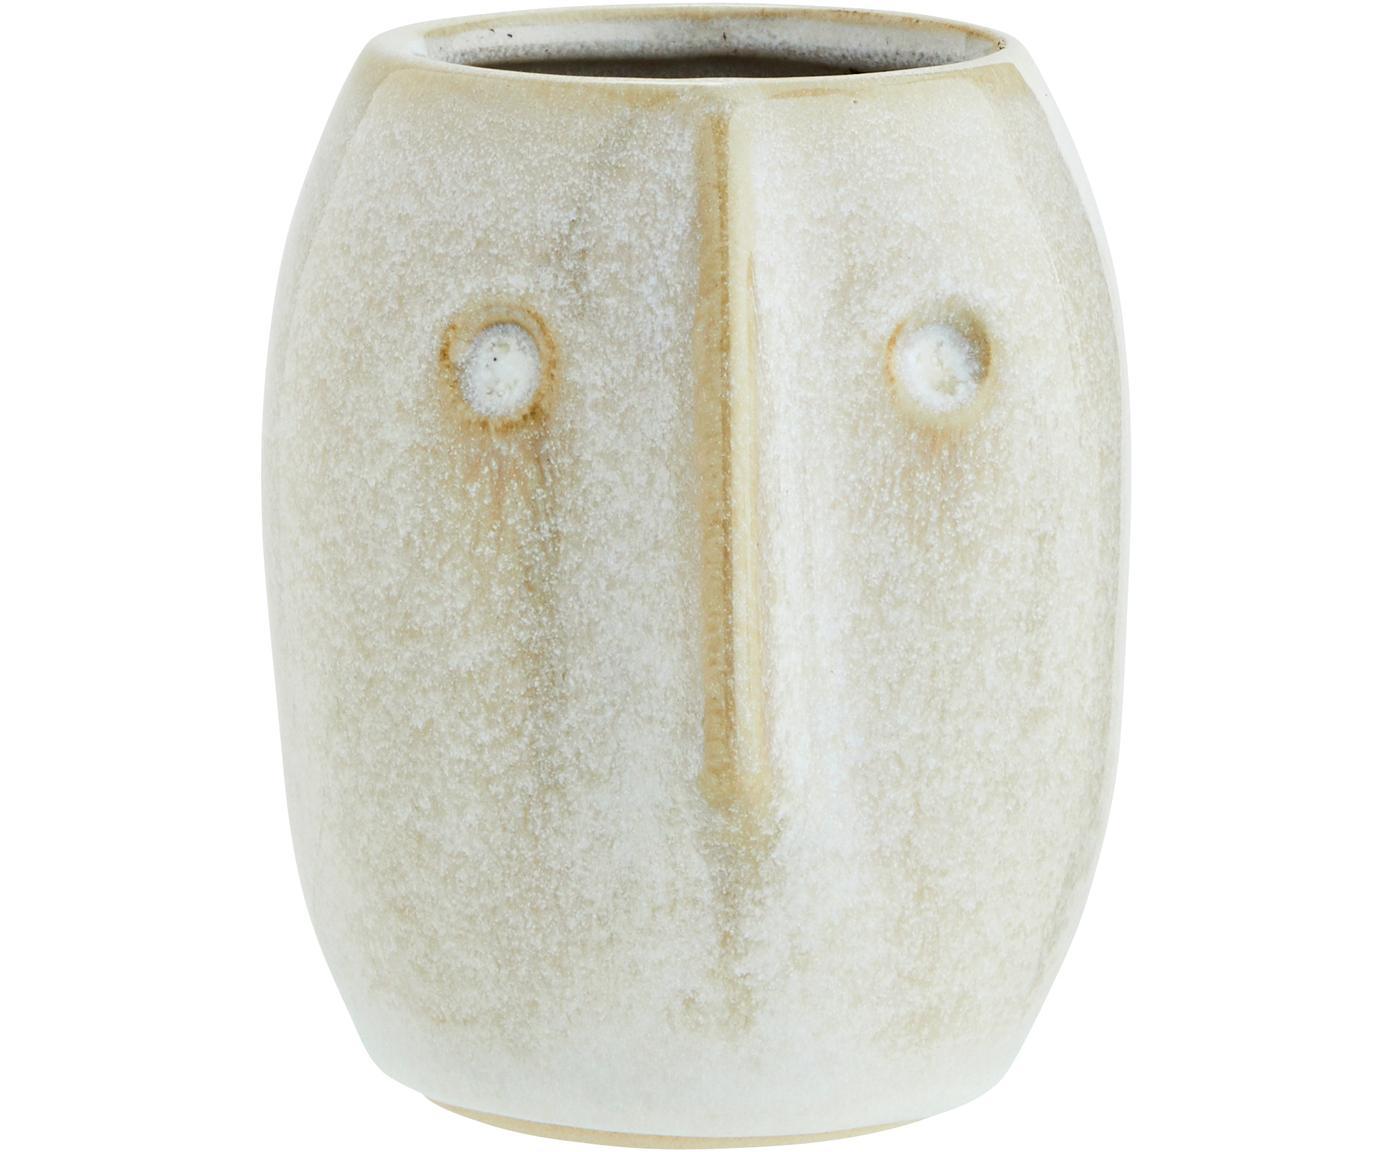 Macetero Face, Gres, Blanco, beige, Ø 8 x Al 10 cm